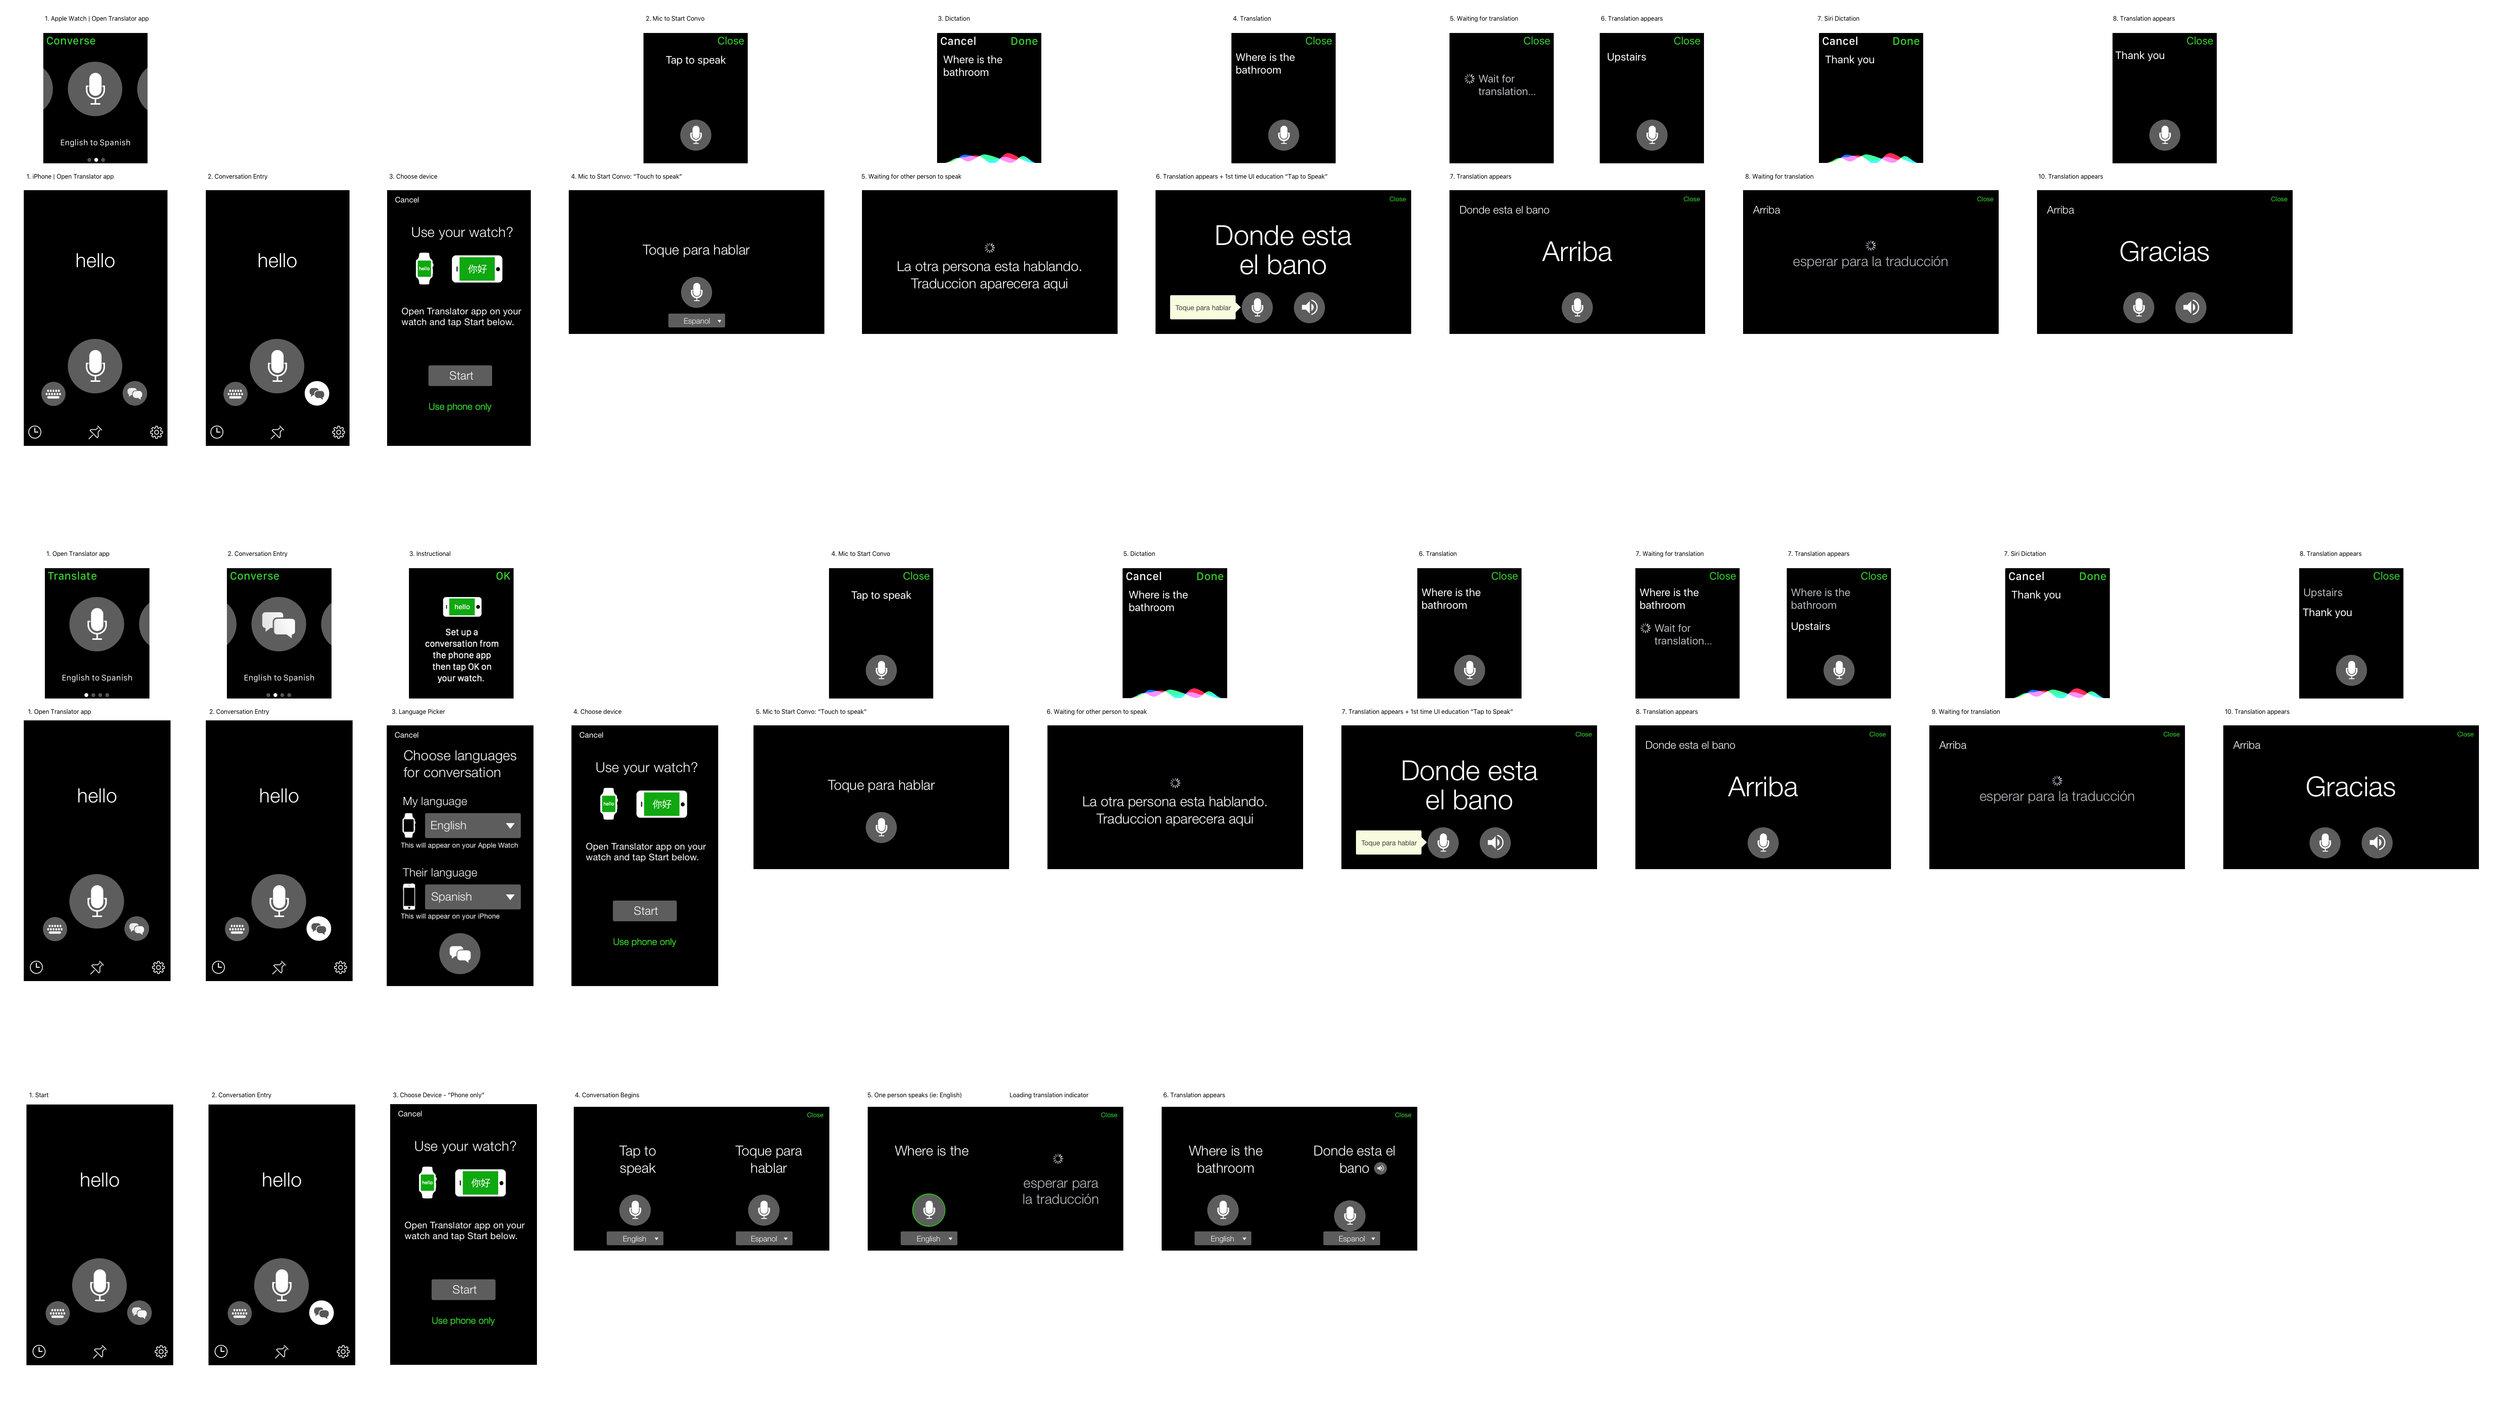 microsofttranslator_storyboardflow.jpg